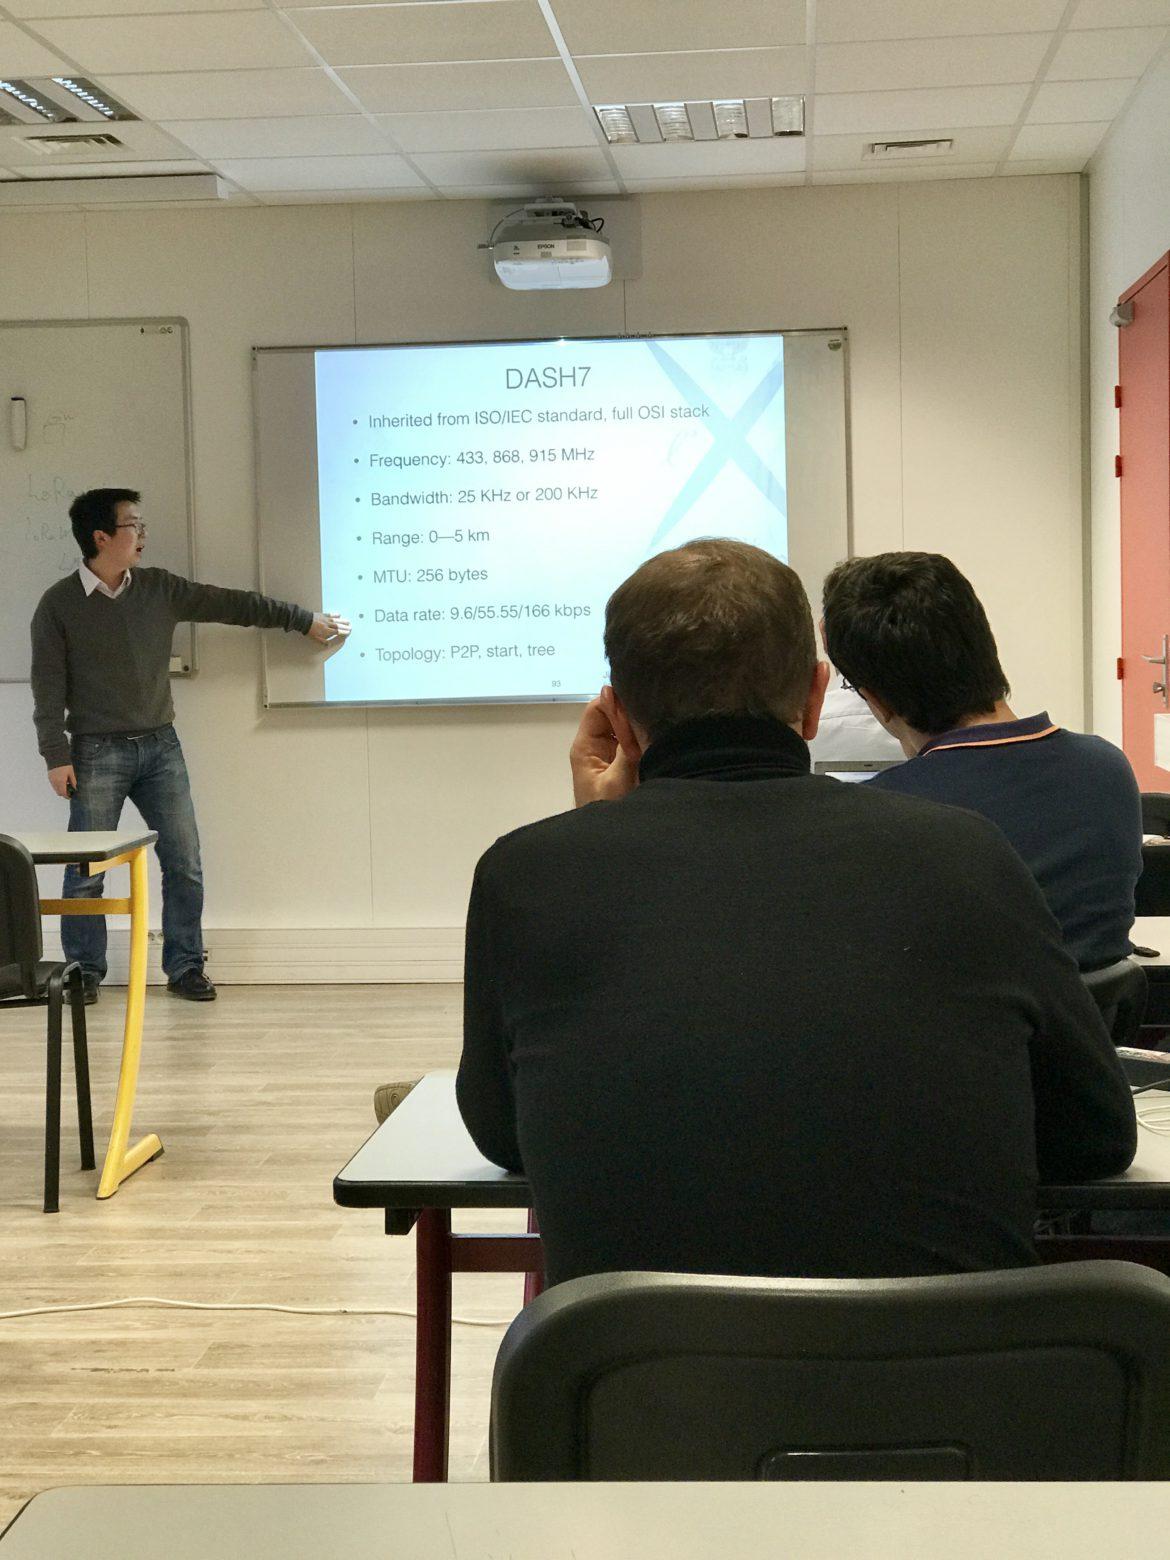 Jiazi Yi teaching IoT at Polytechnique Executive Education